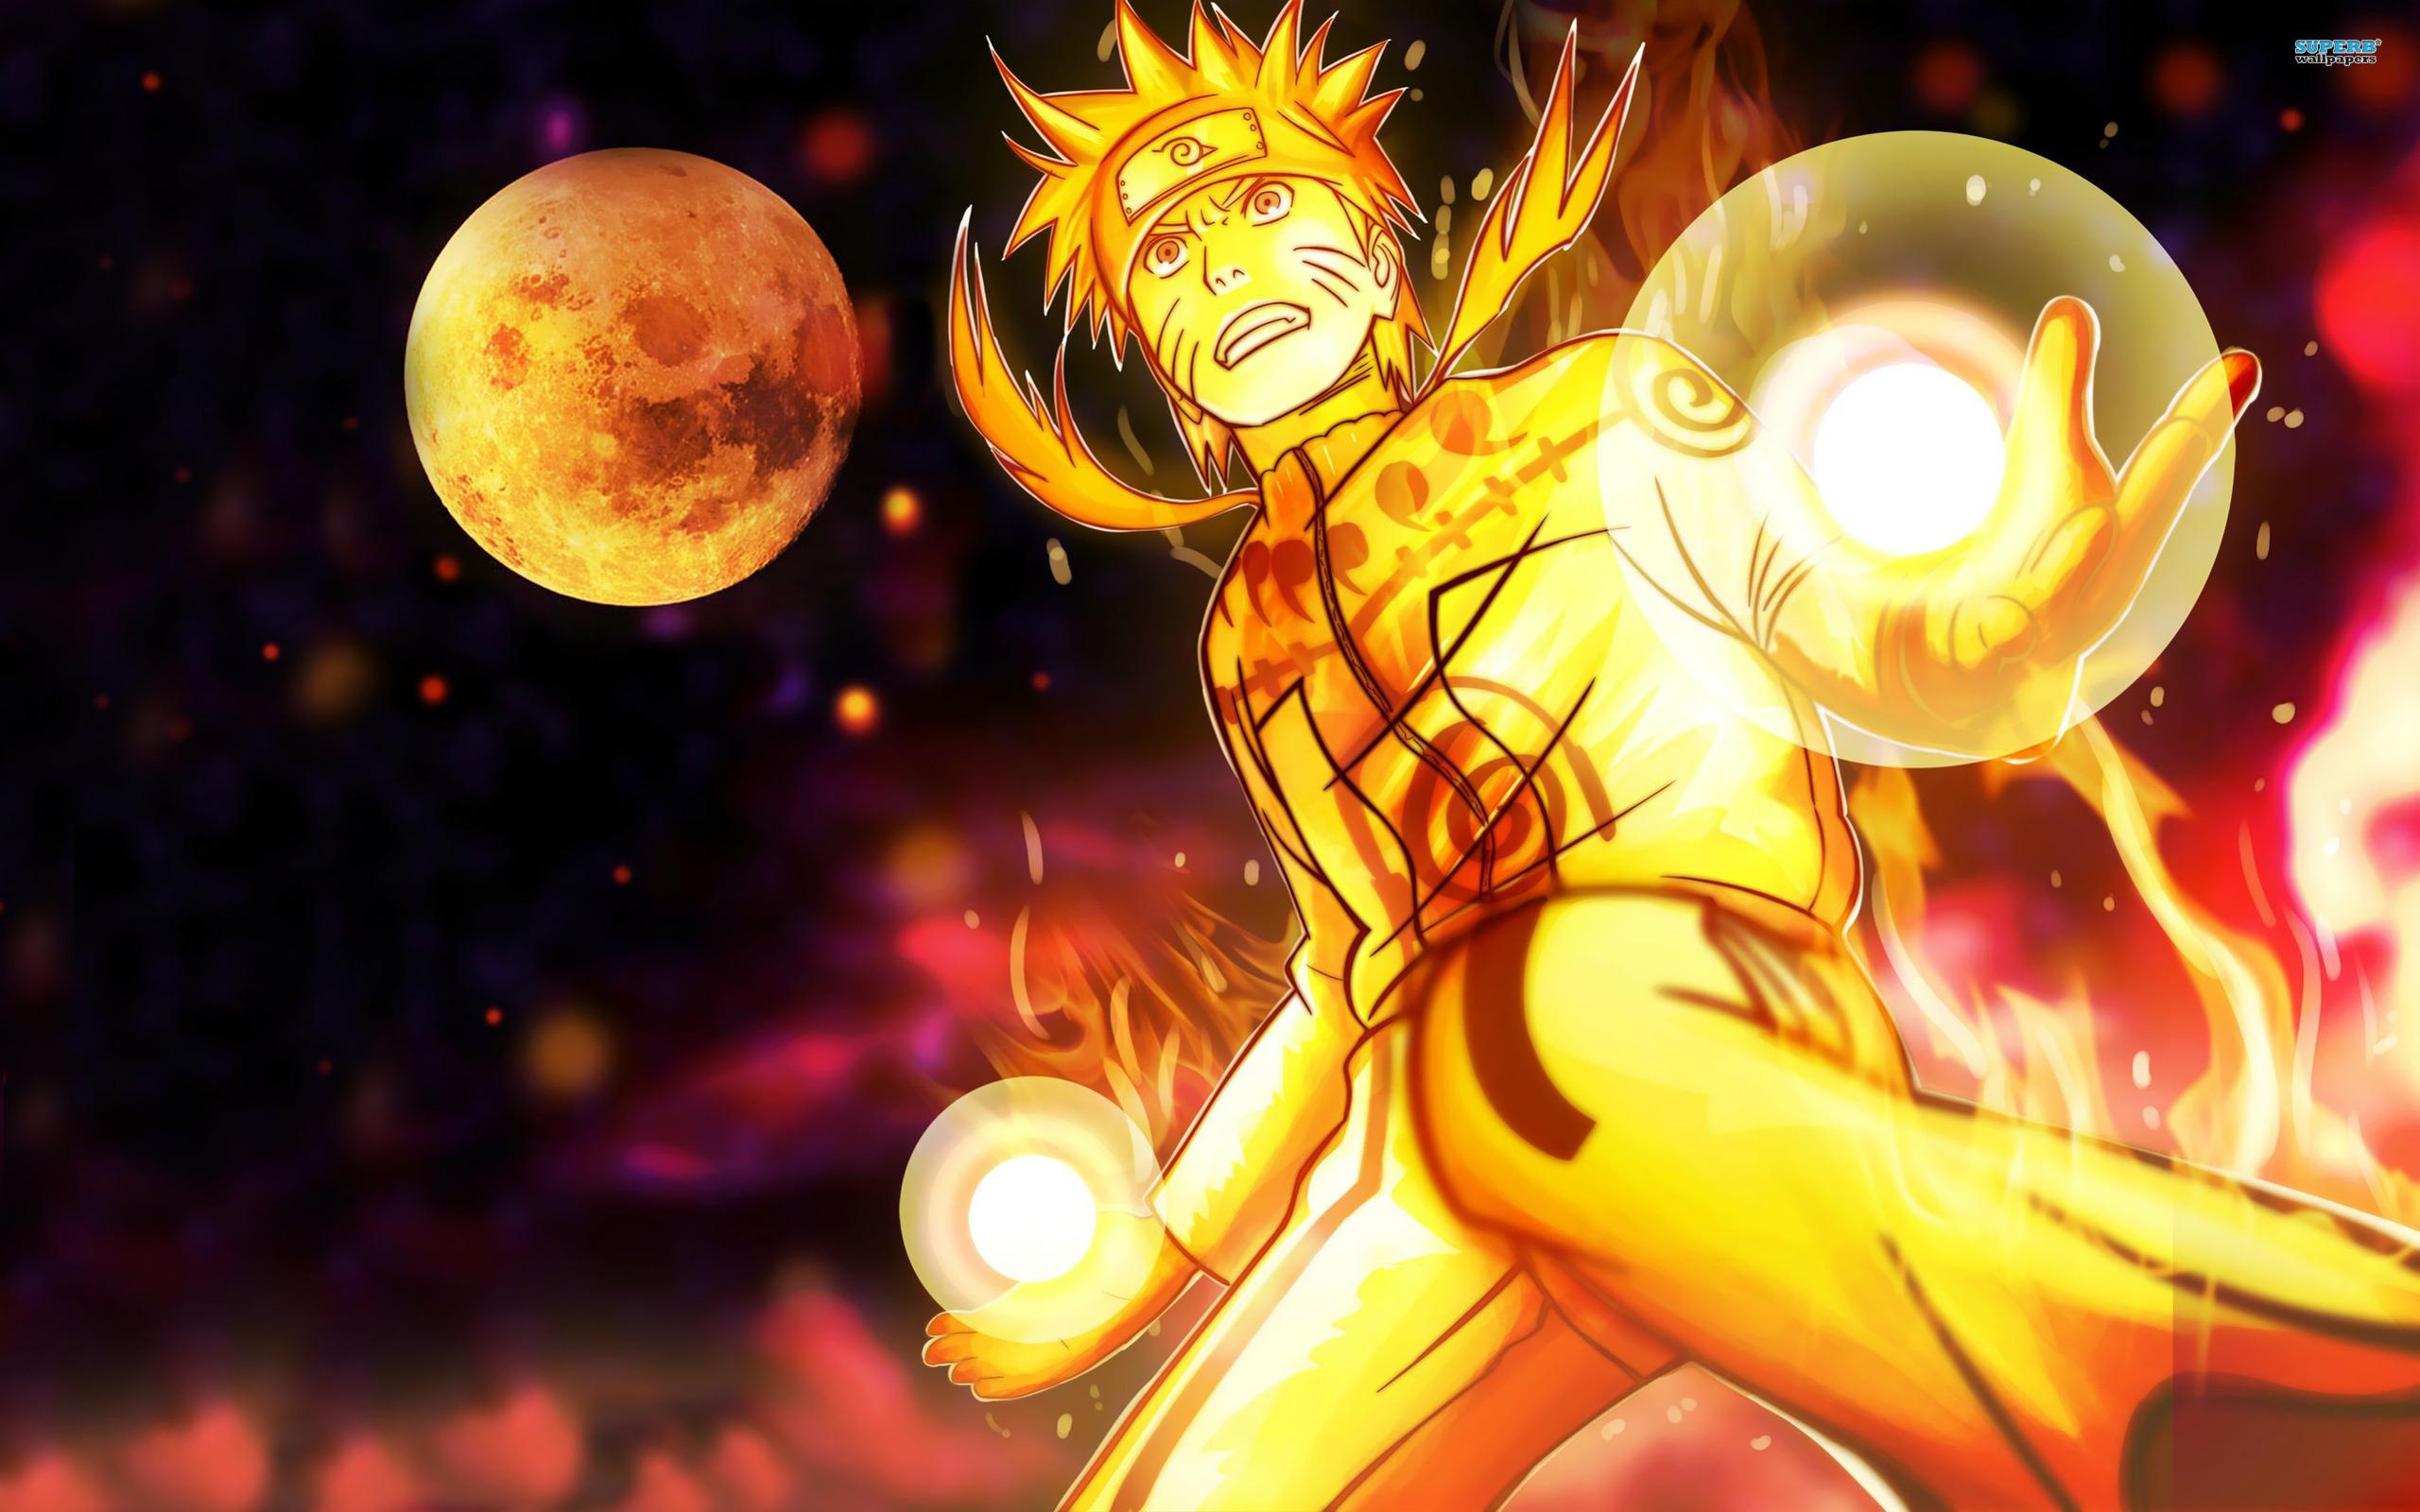 Naruto Desktop HD Wallpaper Animation Wallpapers 2560x1600